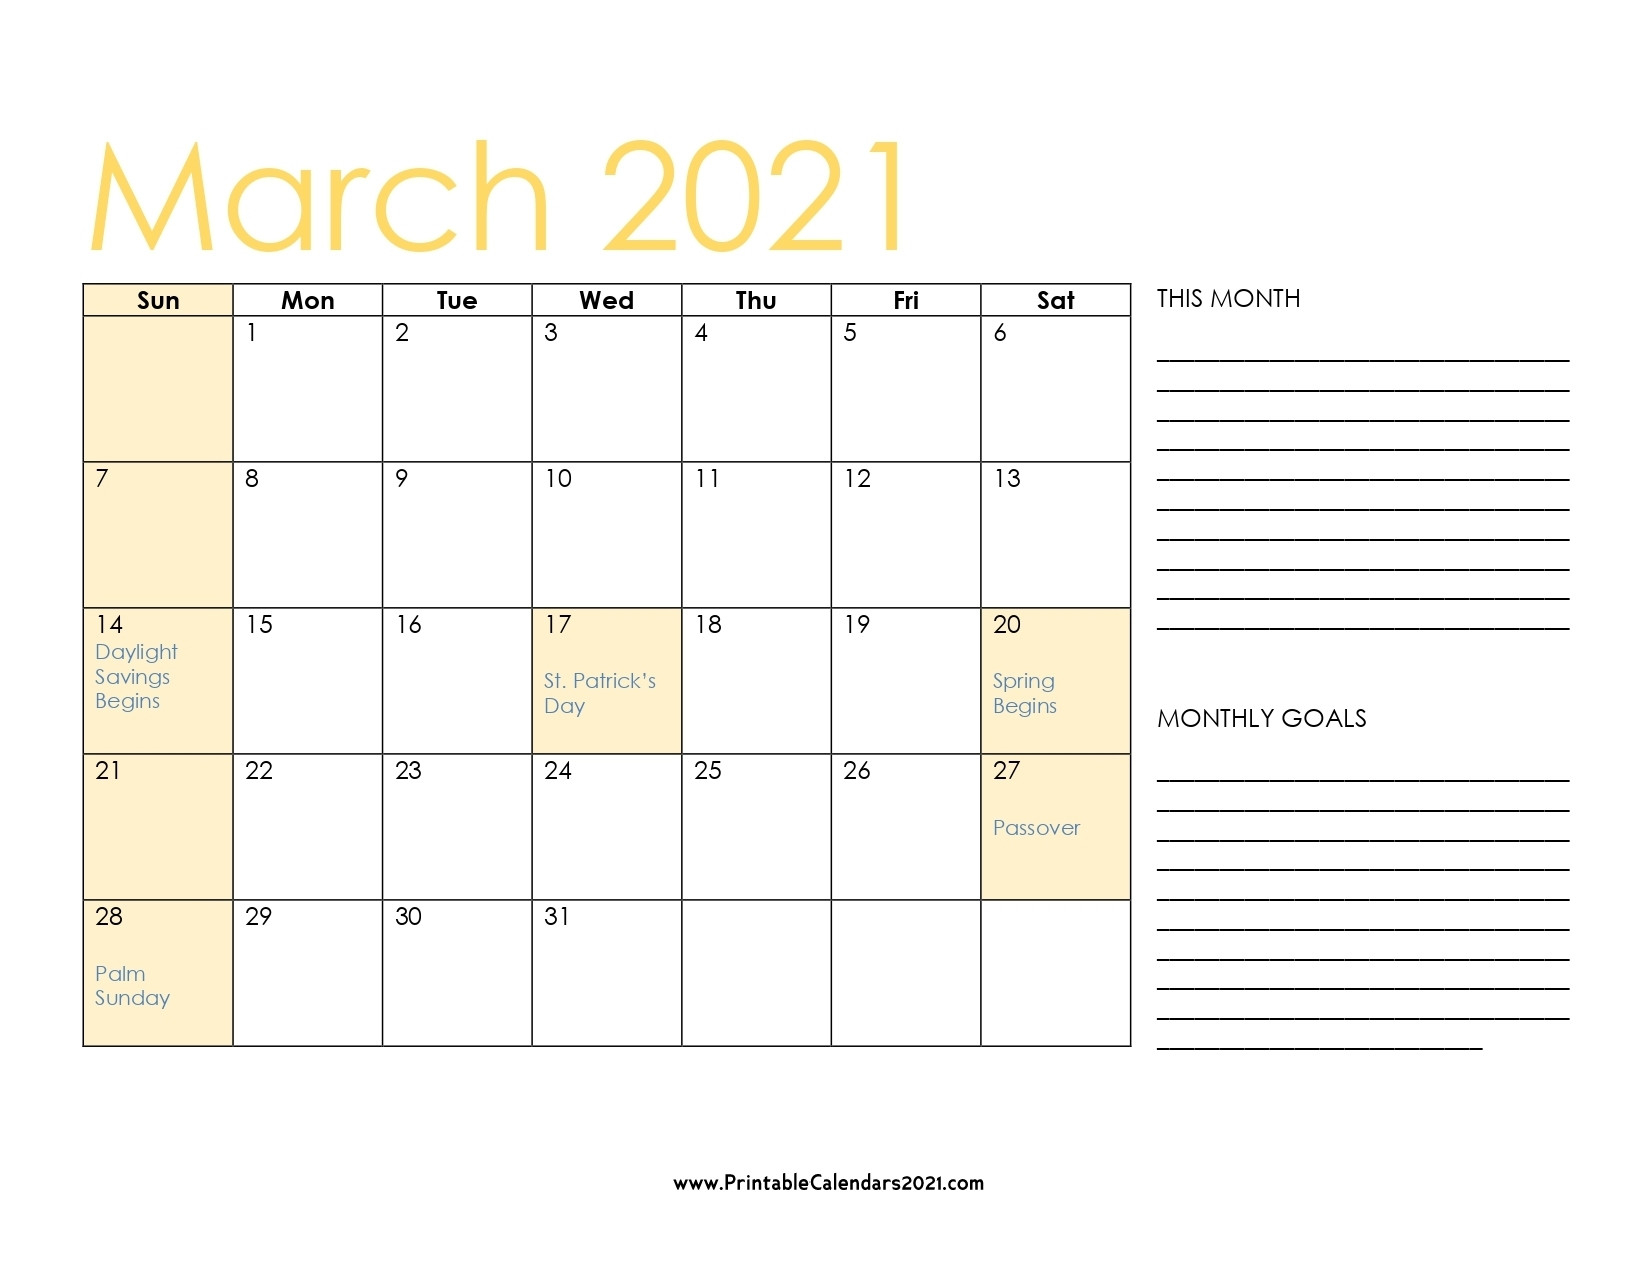 Pick National Food Days 2021 Printable - Best Calendar Example-National Food Days Calendar 2021